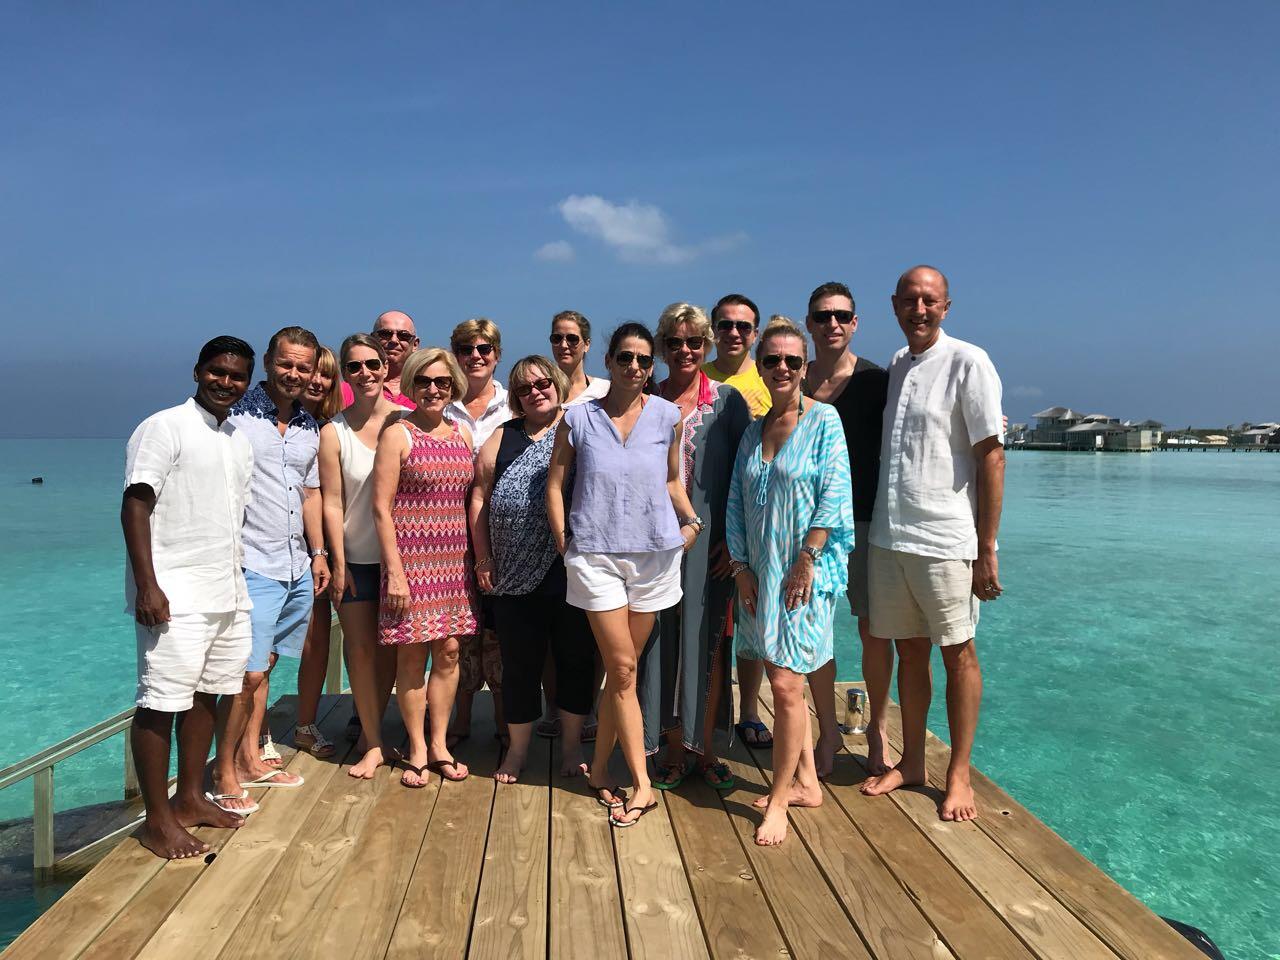 Zu Gast im neuen Soneva Jani Resort auf den Malediven strand sonne reisebericht new malediven honeymoon 2  TUI Berlin Reisebüro Soneva Jani Gruppenfoto